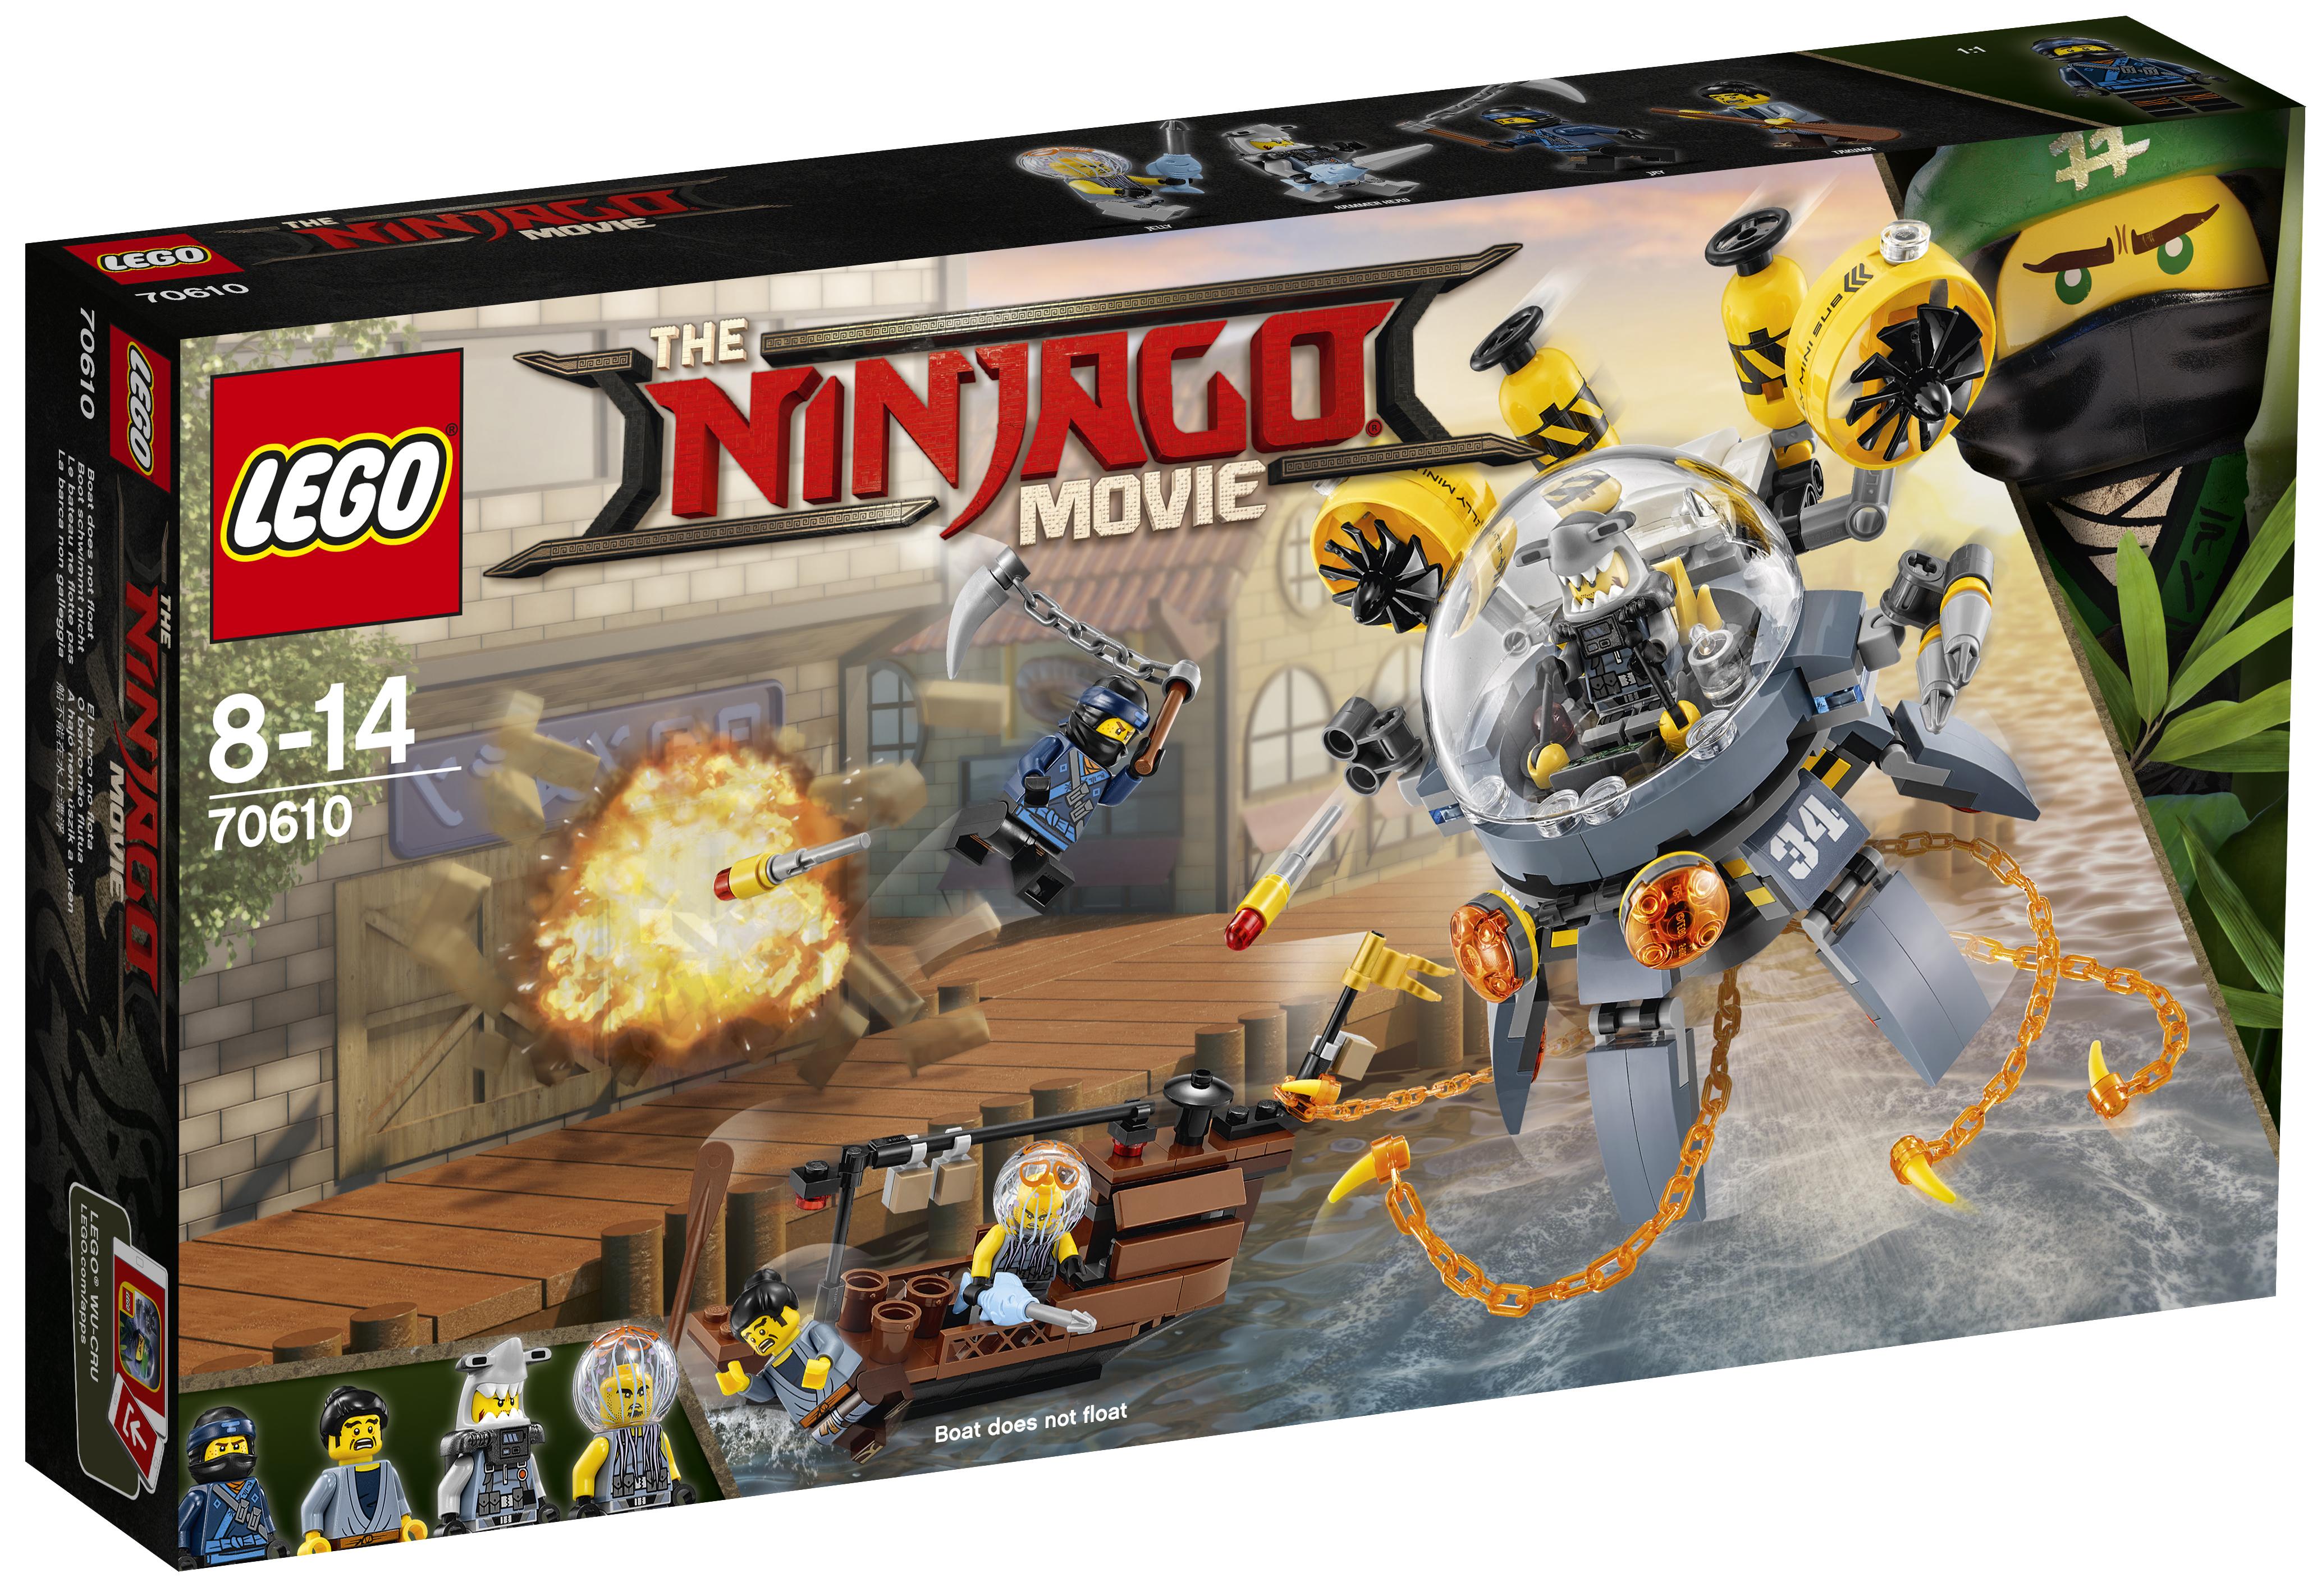 LEGO LEGO Конструктор LEGO Ninjago 70610 Летучая субмарина «Медуза»